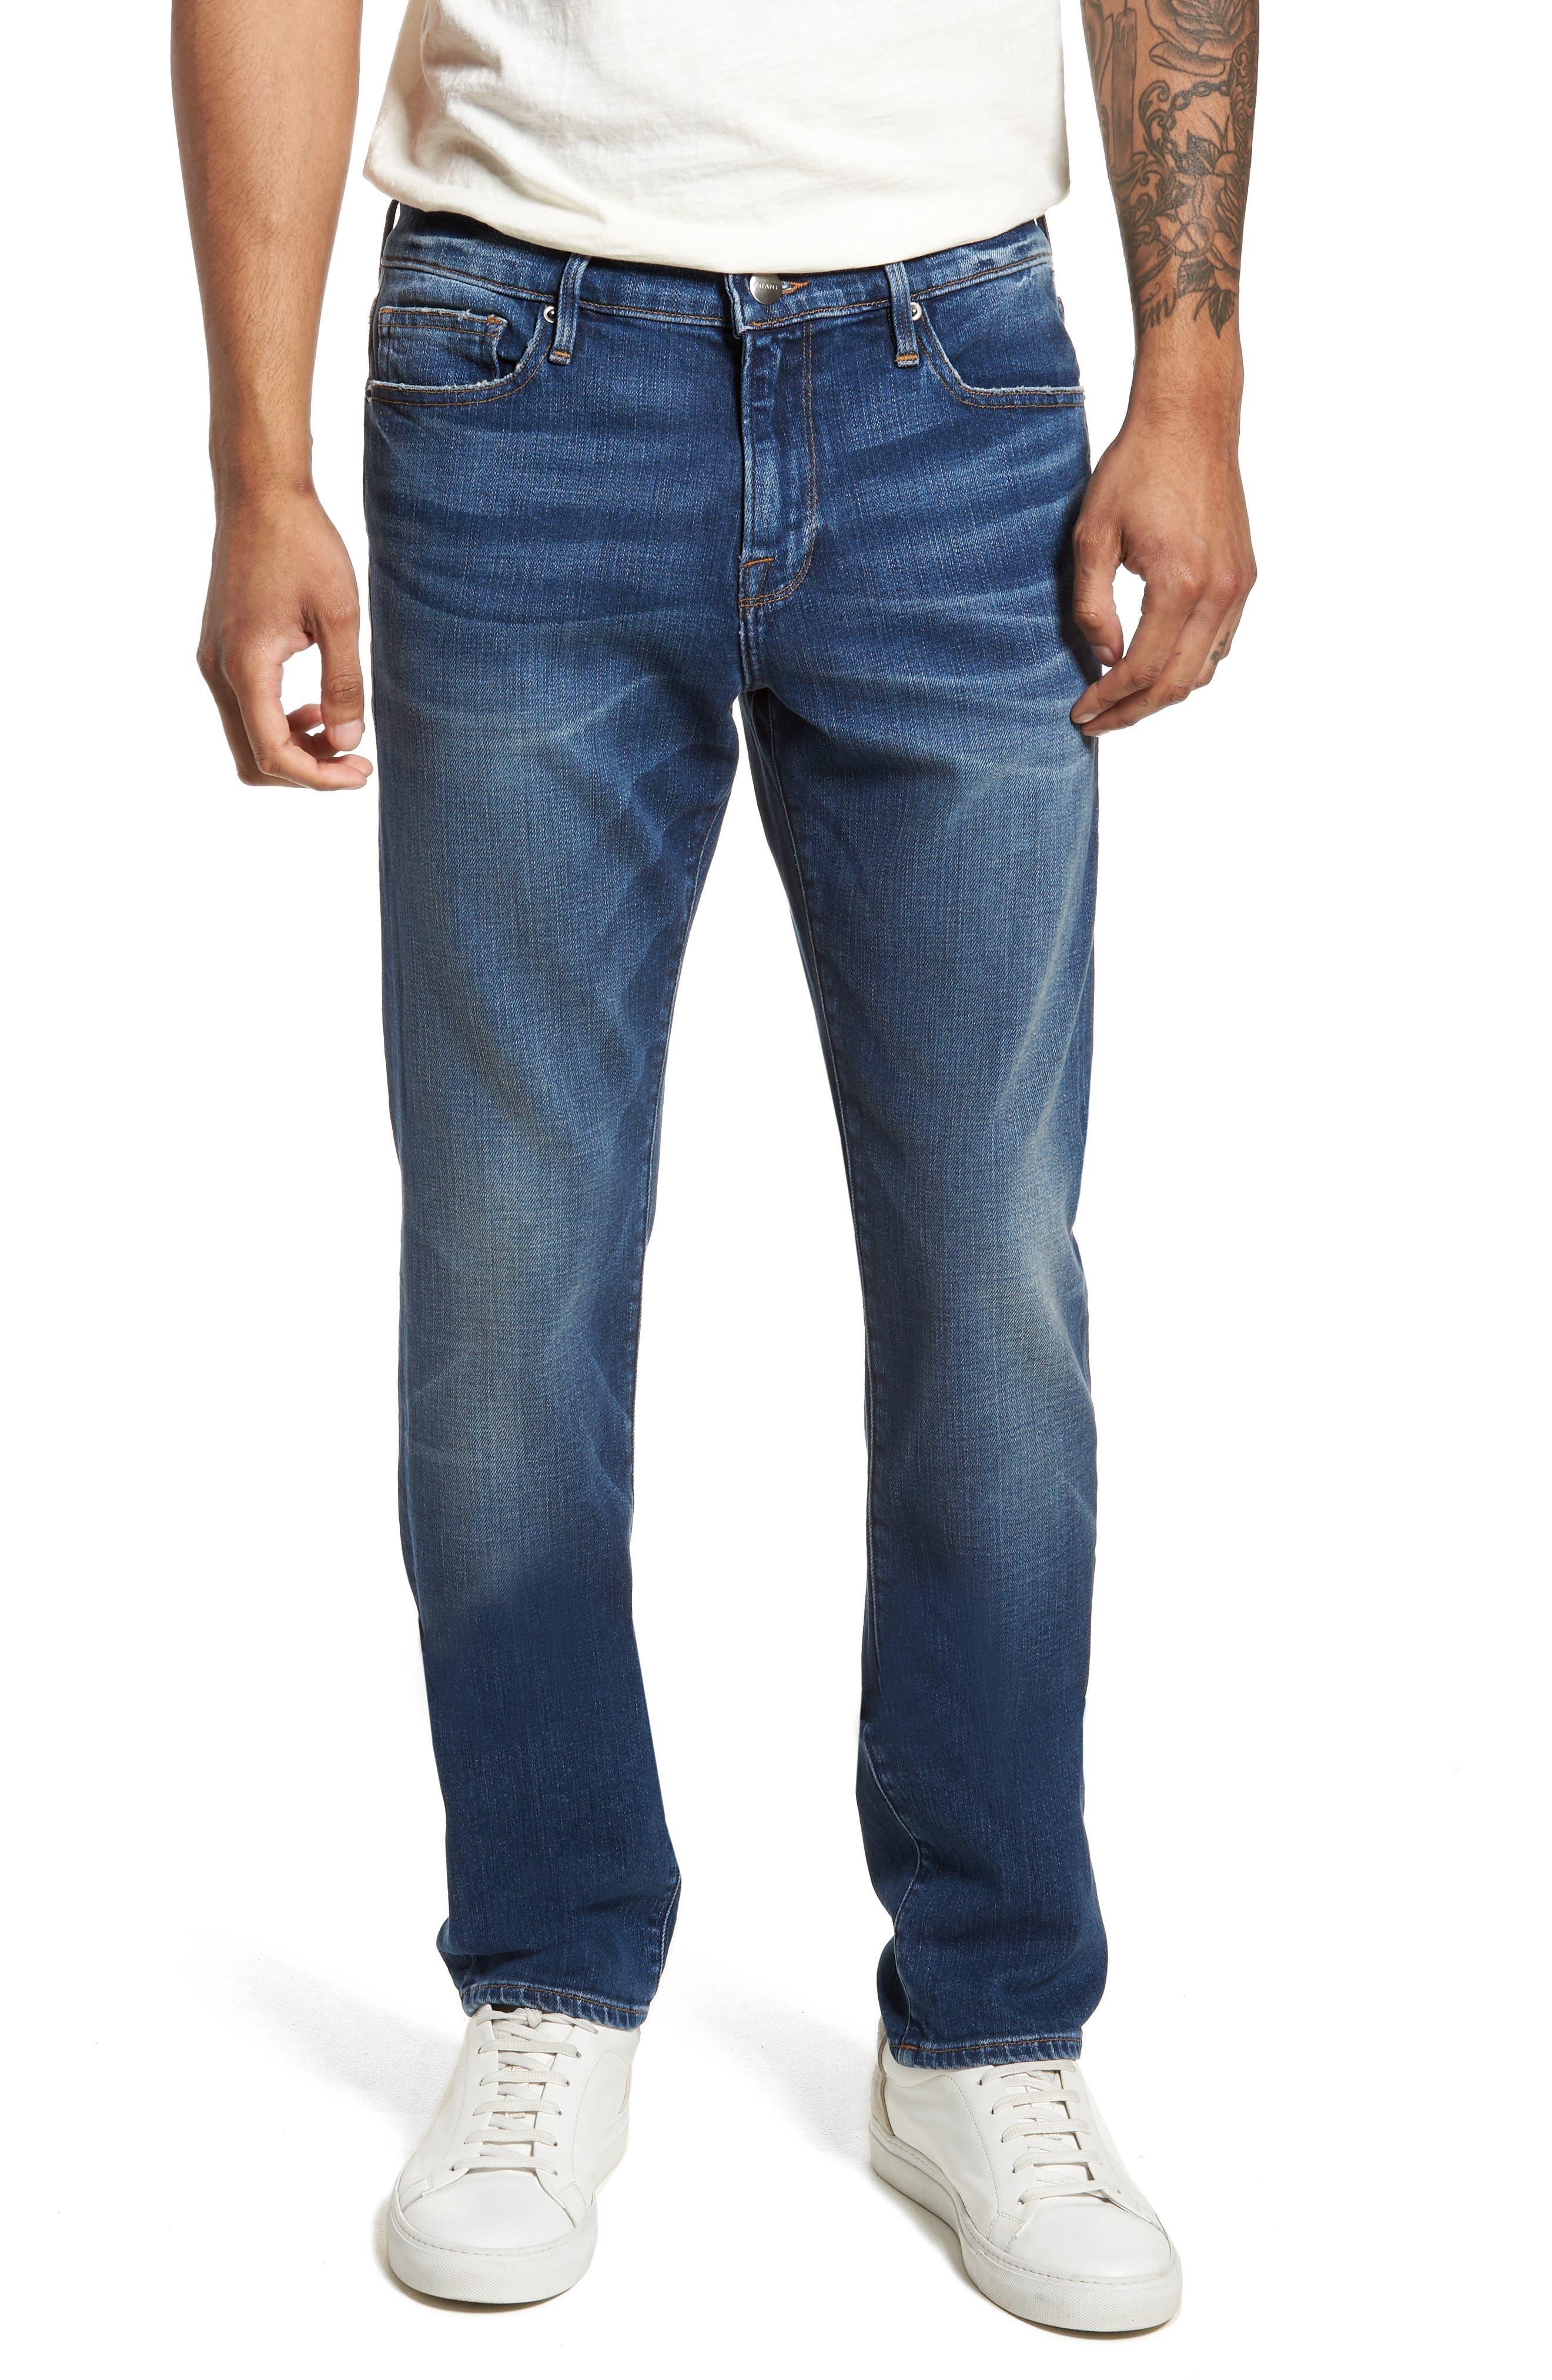 L'Homme Skinny Fit Jeans,                         Main,                         color, 420